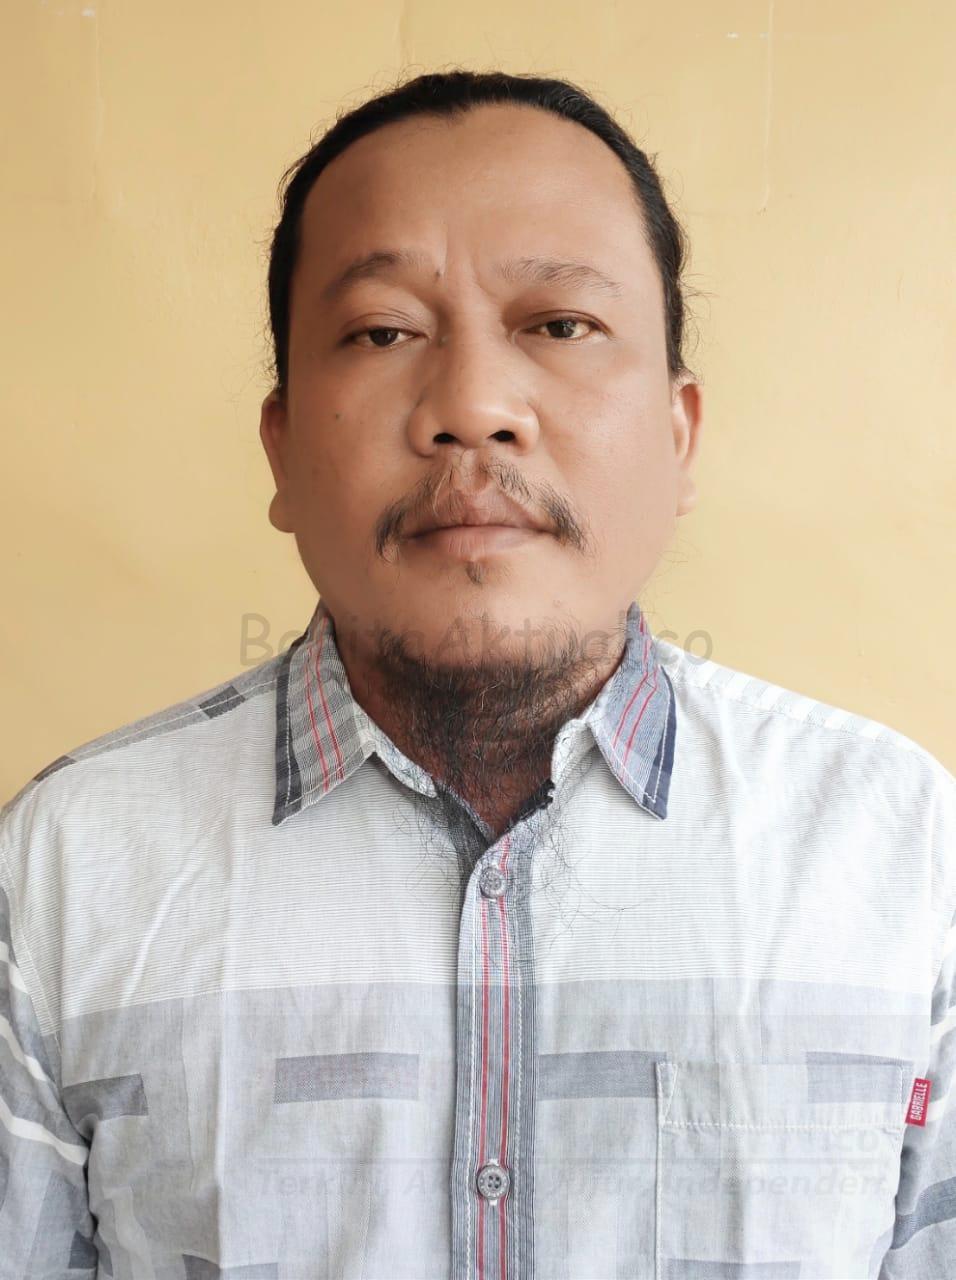 Polsek Padang Hulu Tangkap Karyawan Swasta Pemilik Sabu 2 IMG 20200927 WA0055